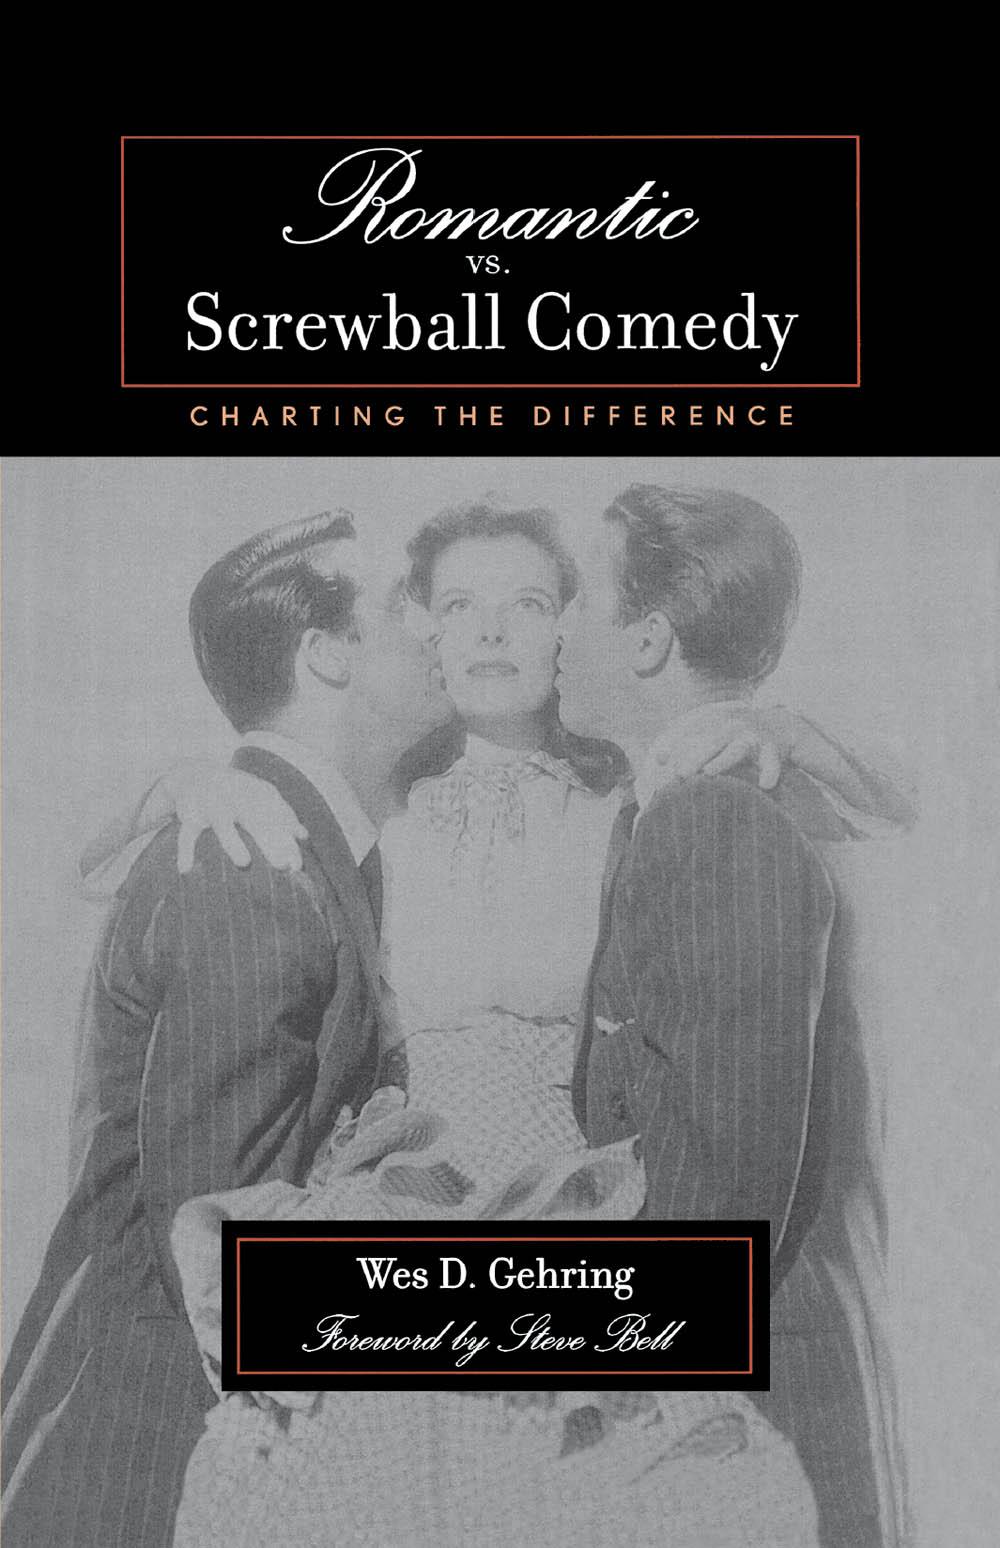 Romantic vs. Screwball Comedy